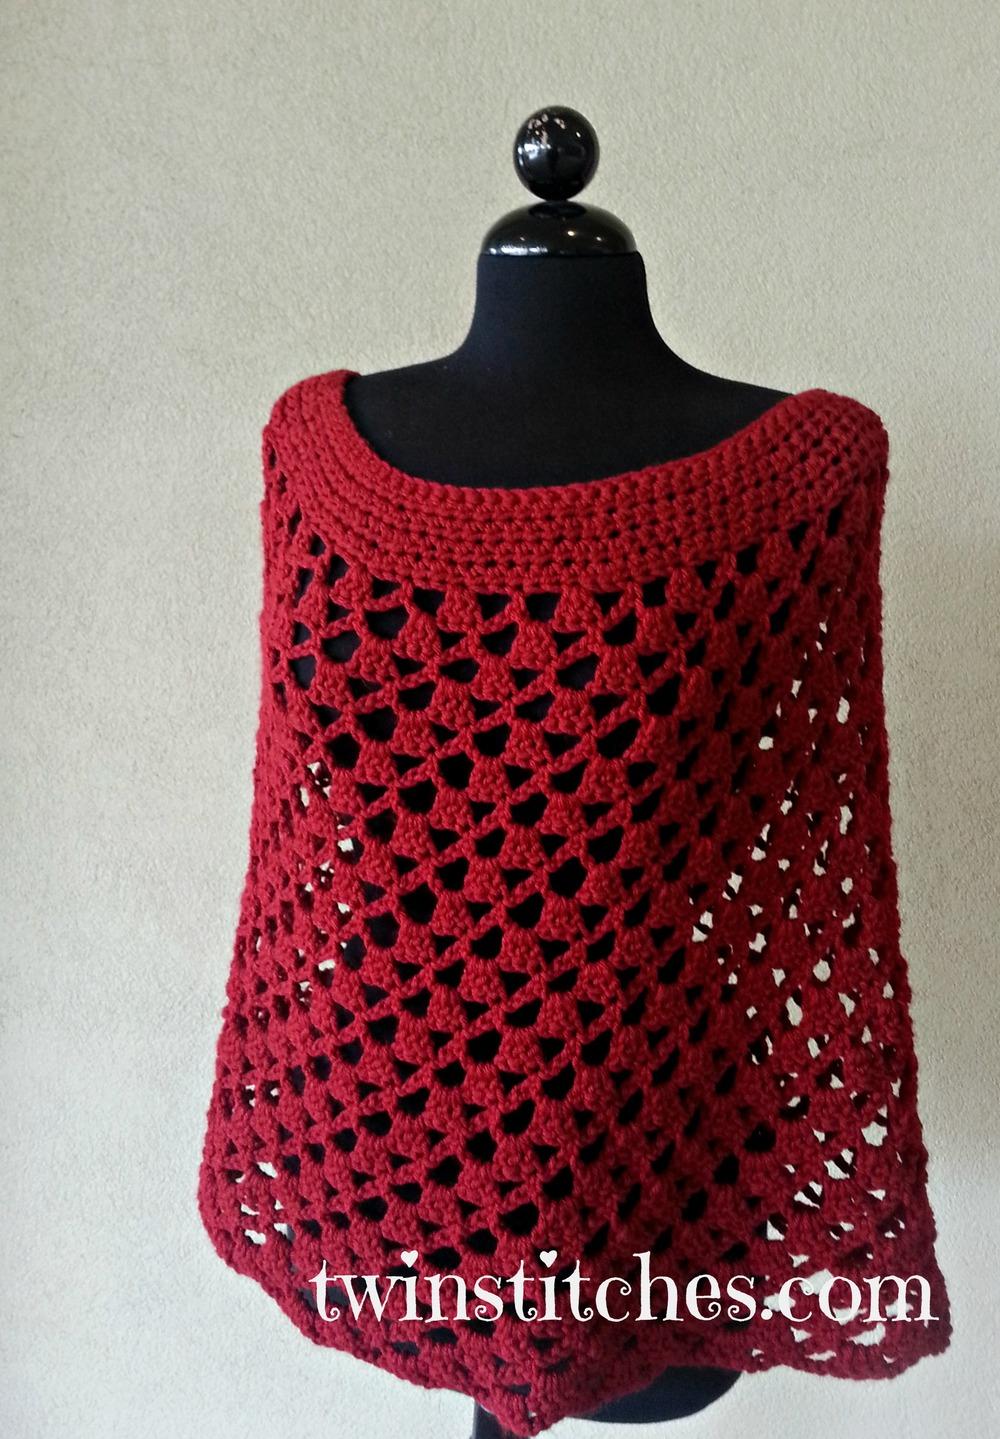 Scarlett Spiral Crochet Poncho AllFreeCrochet.com